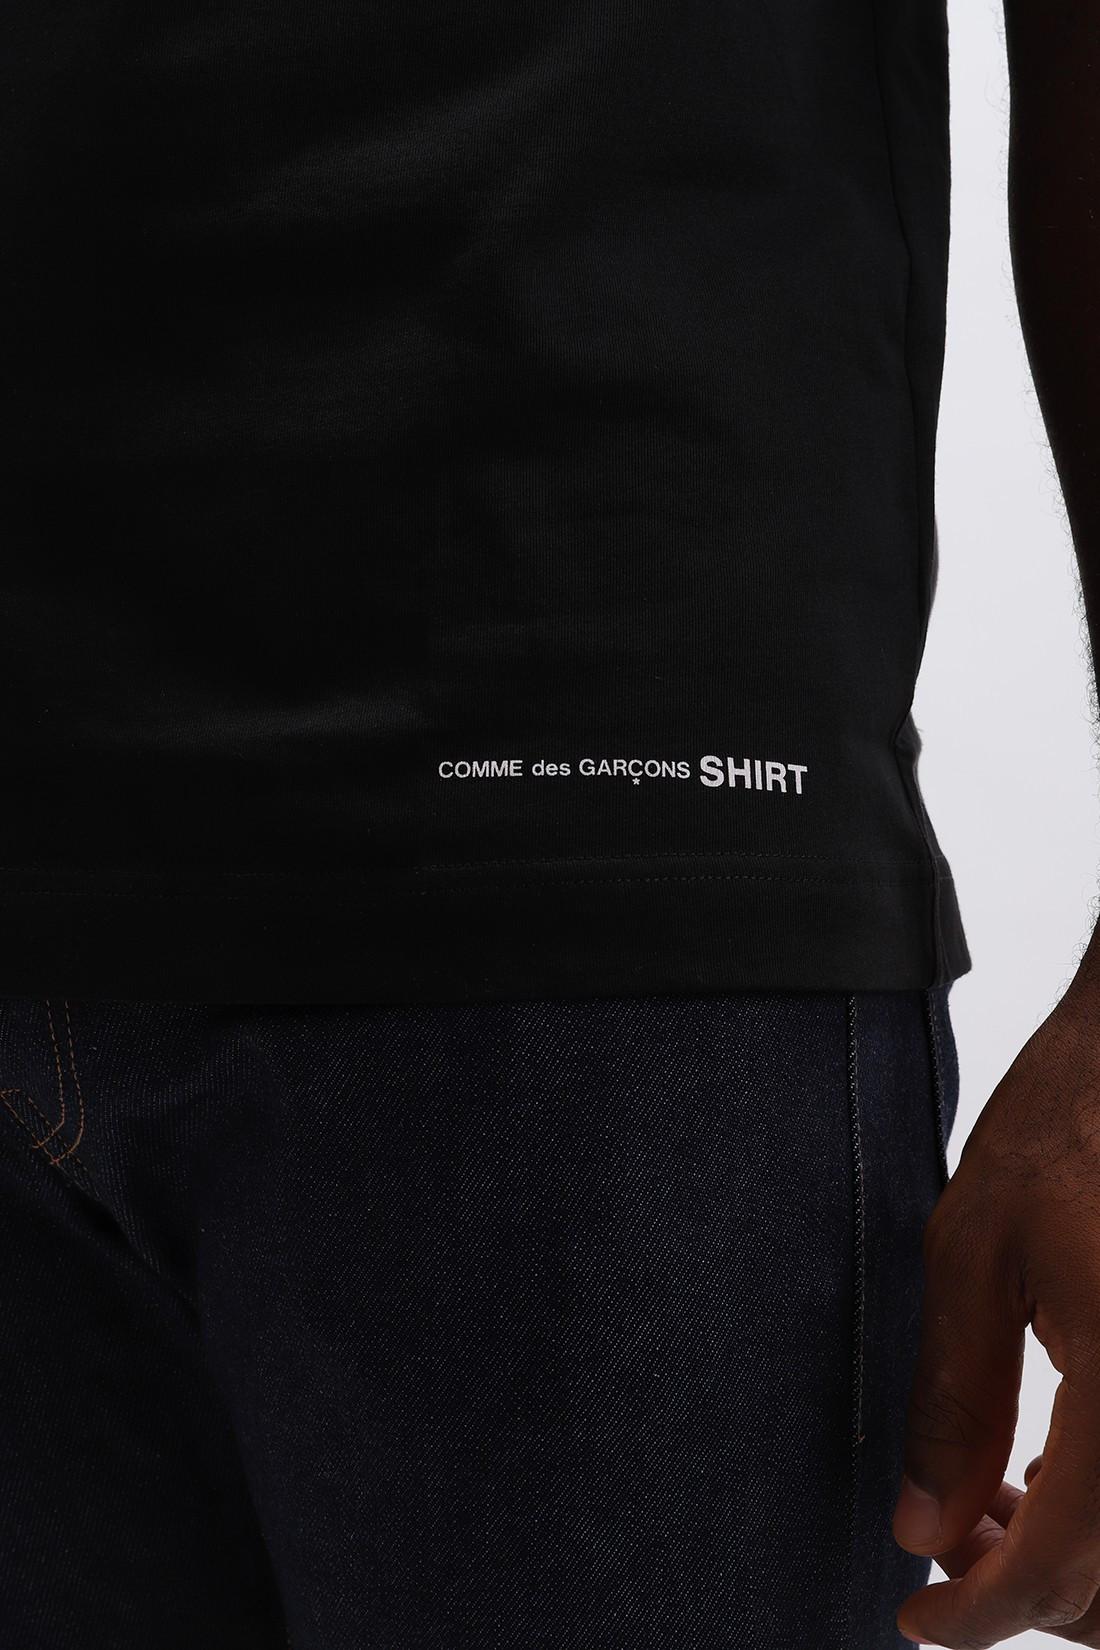 COMME DES GARÇONS SHIRT / W27111 classic ss tee Black